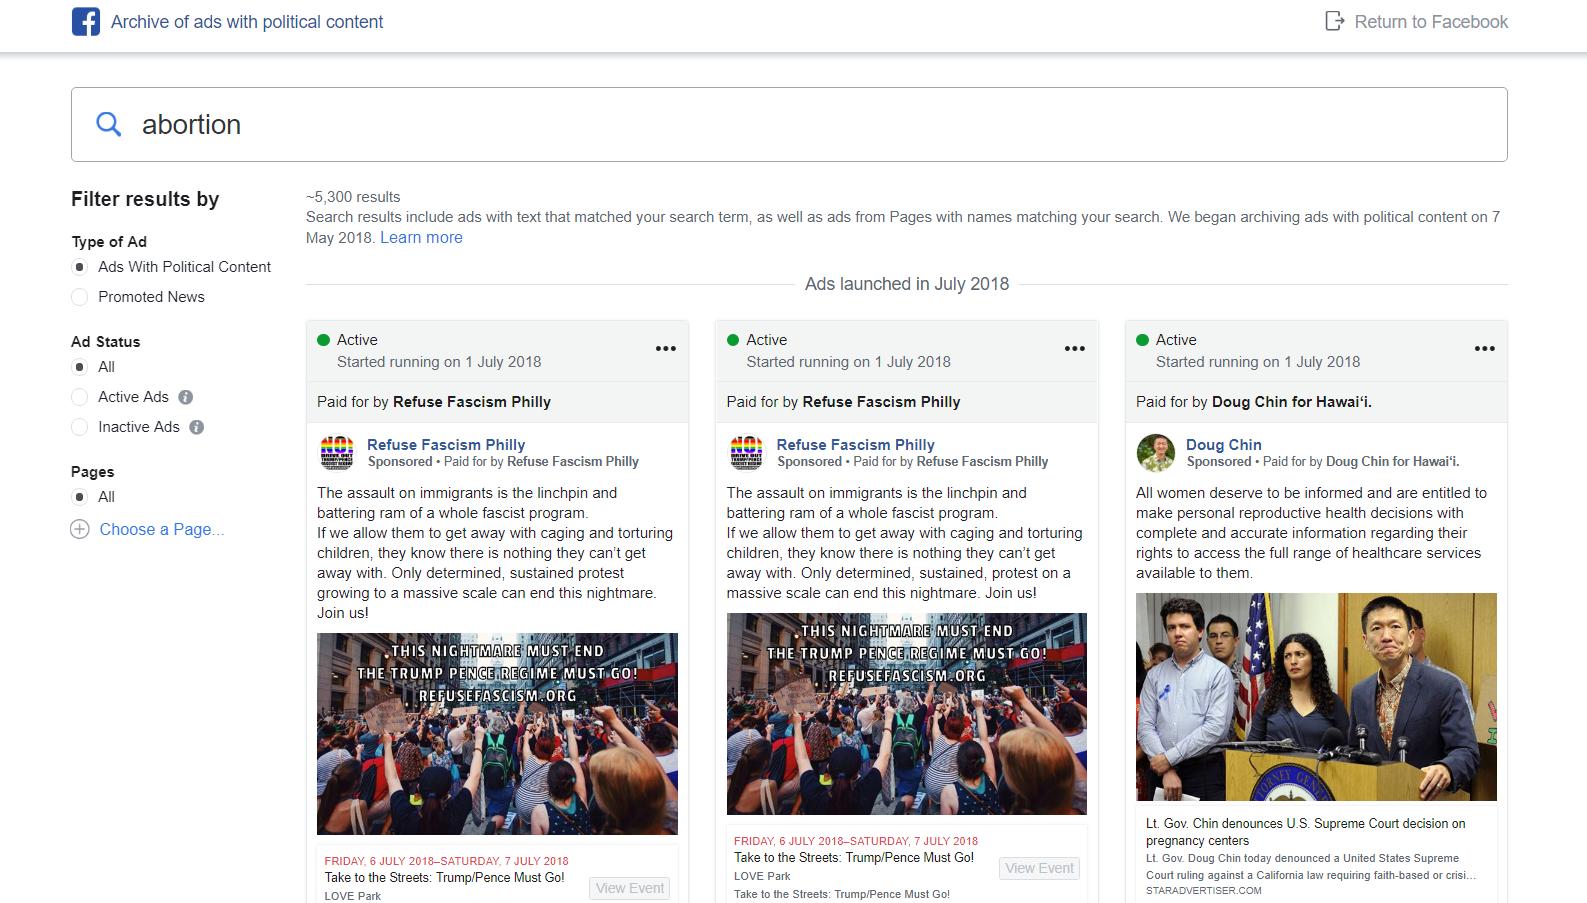 Facebook political ads archive